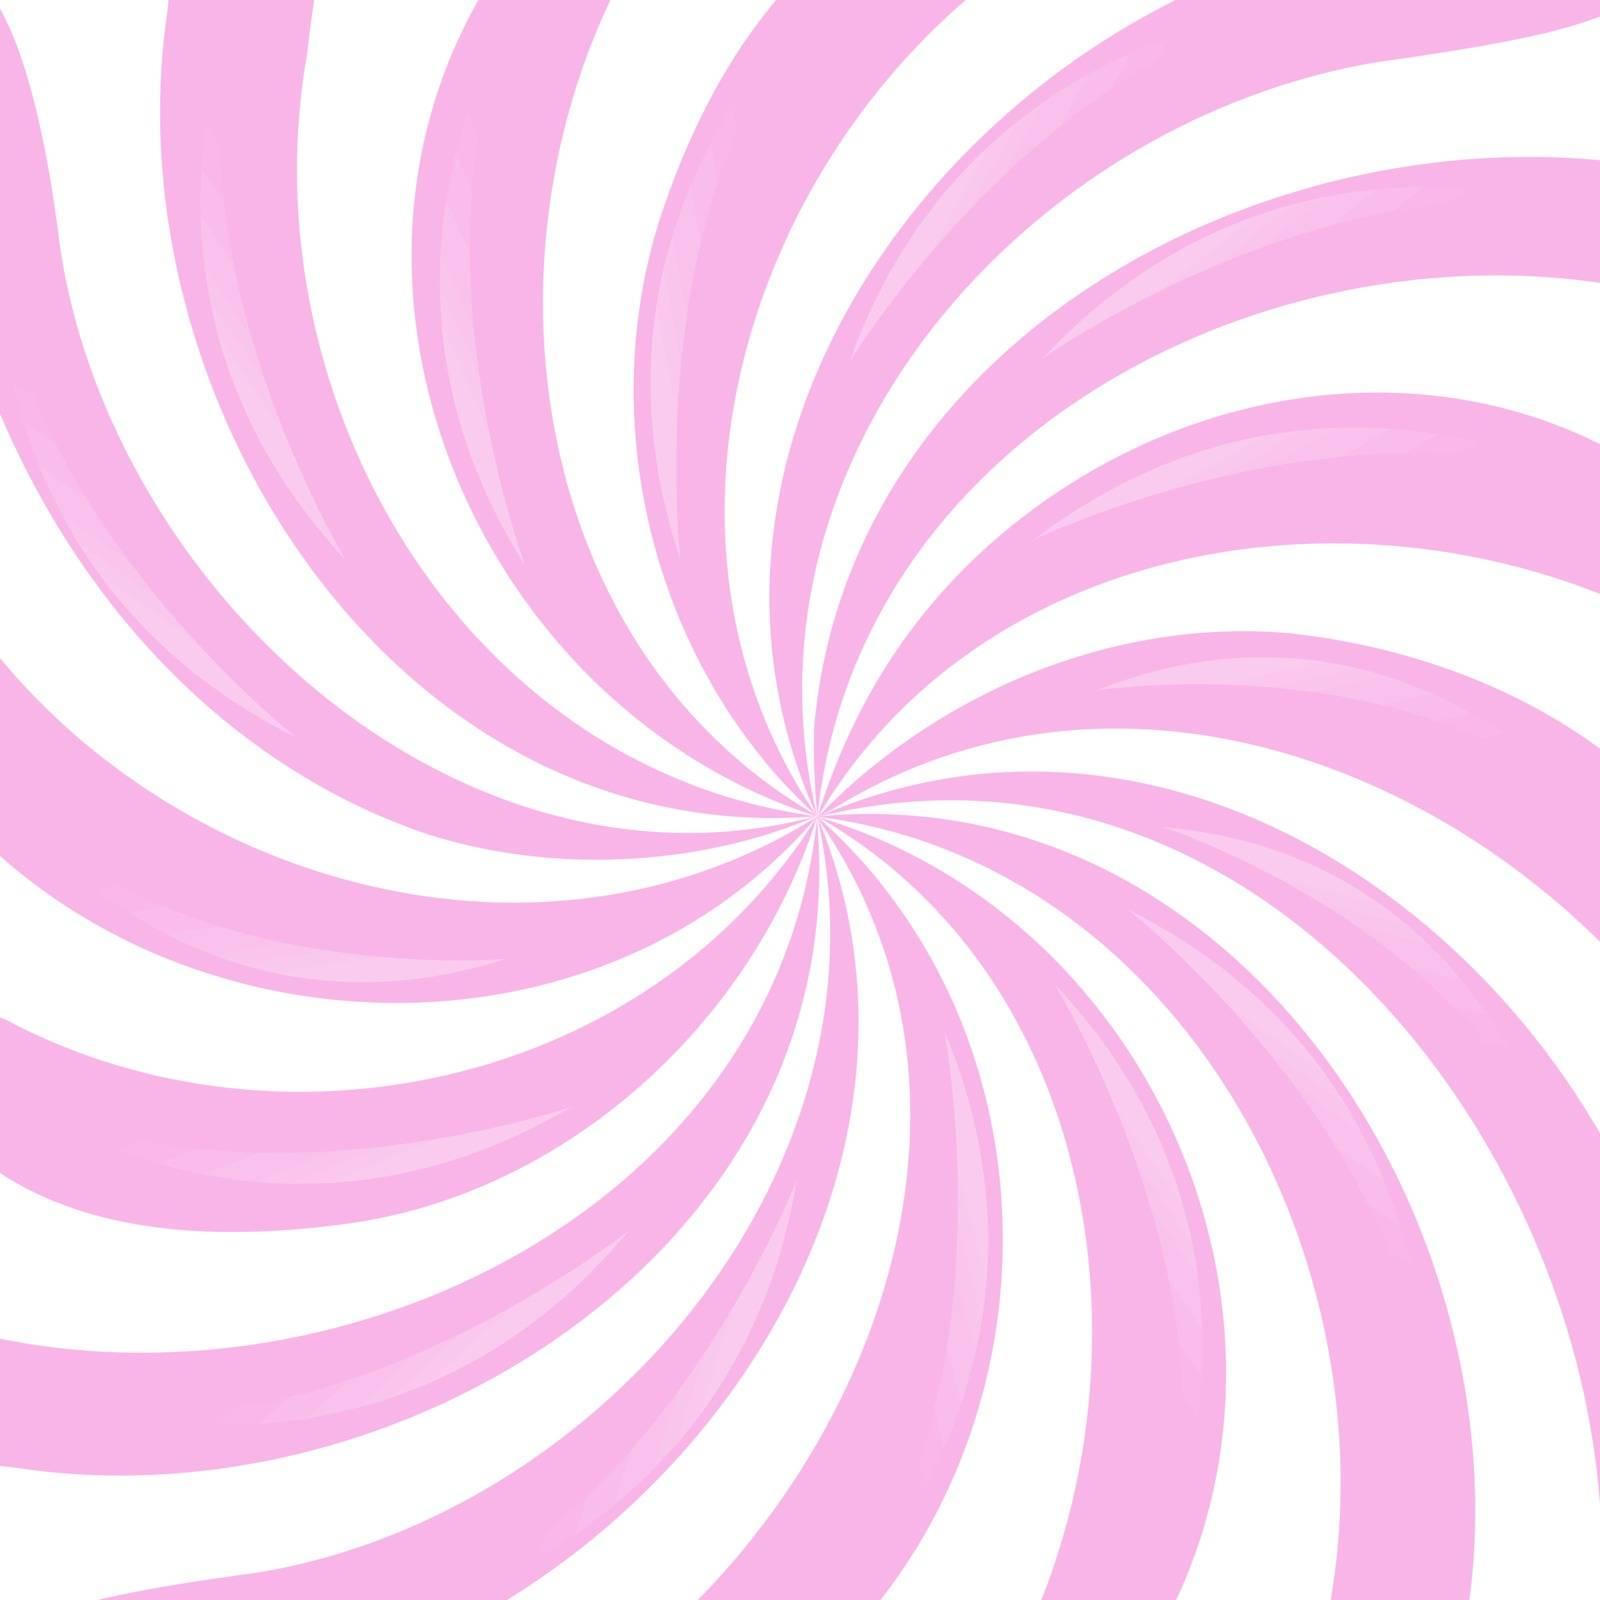 Pink Sunburst, Vector Illustration, With Gradient Mesh